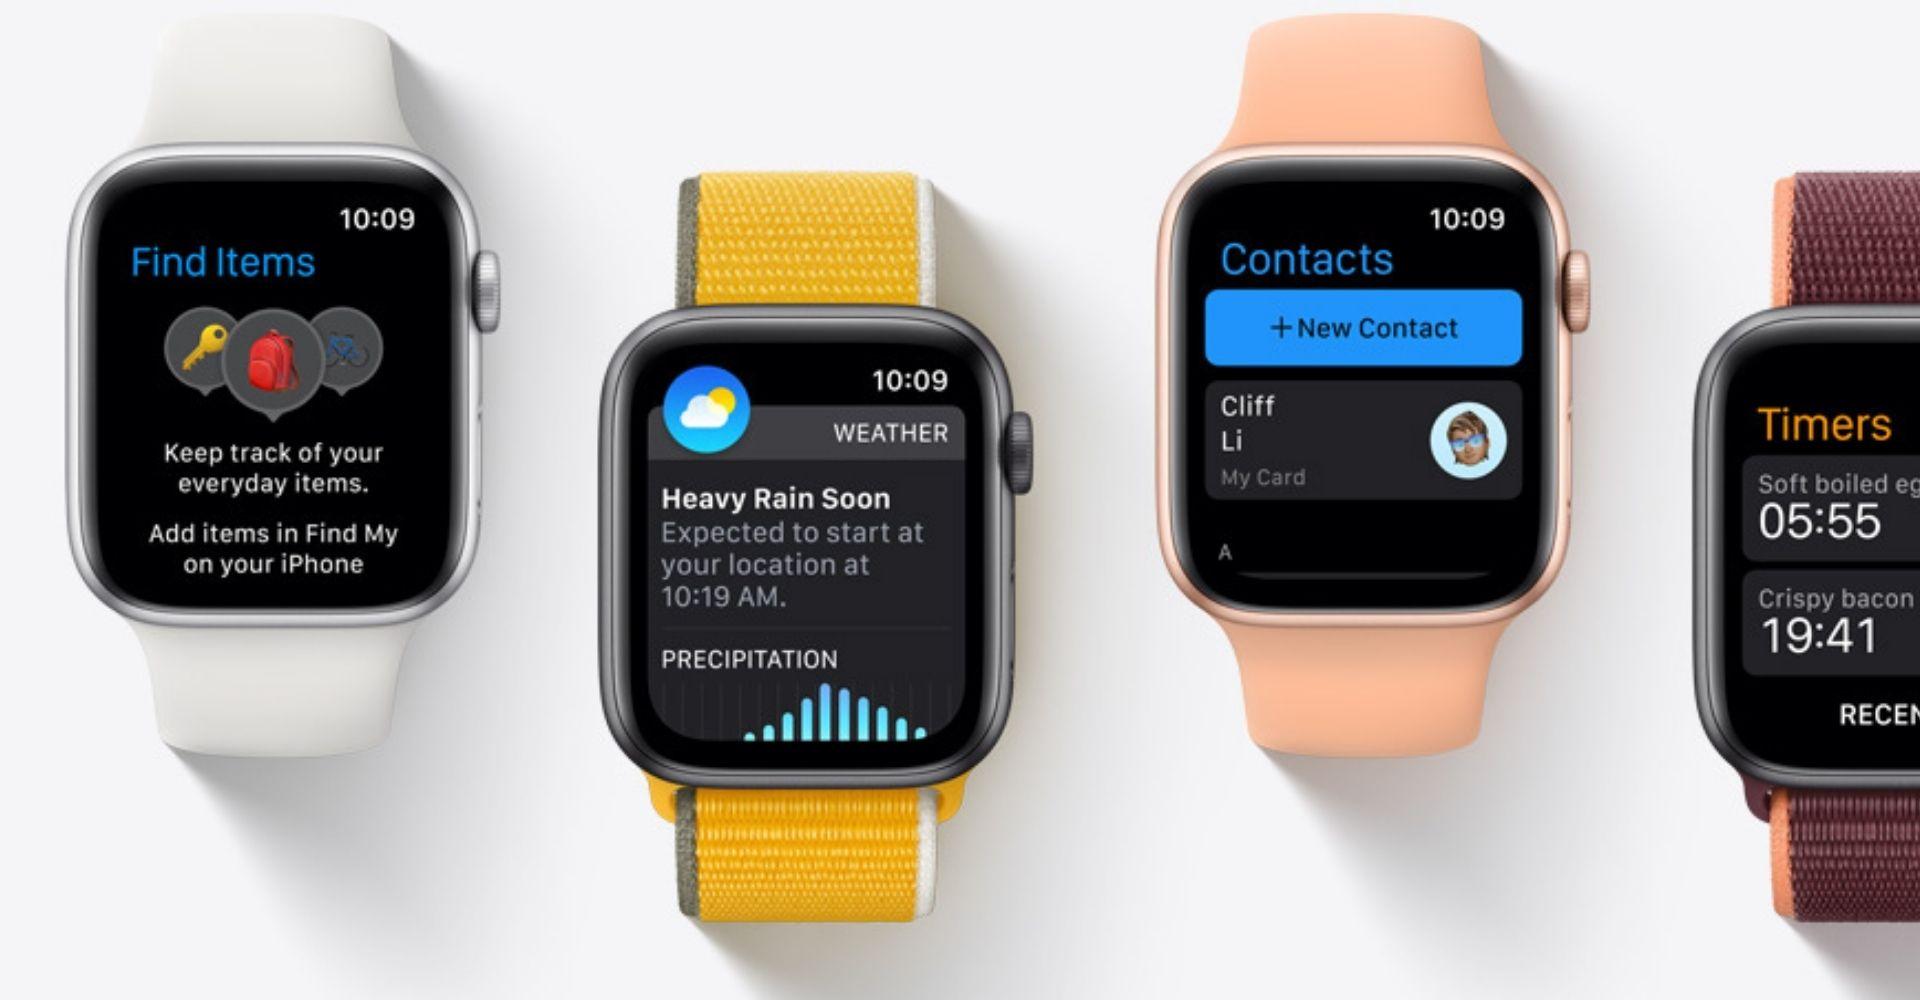 Apple watchOS 8 Running On Apple Watch